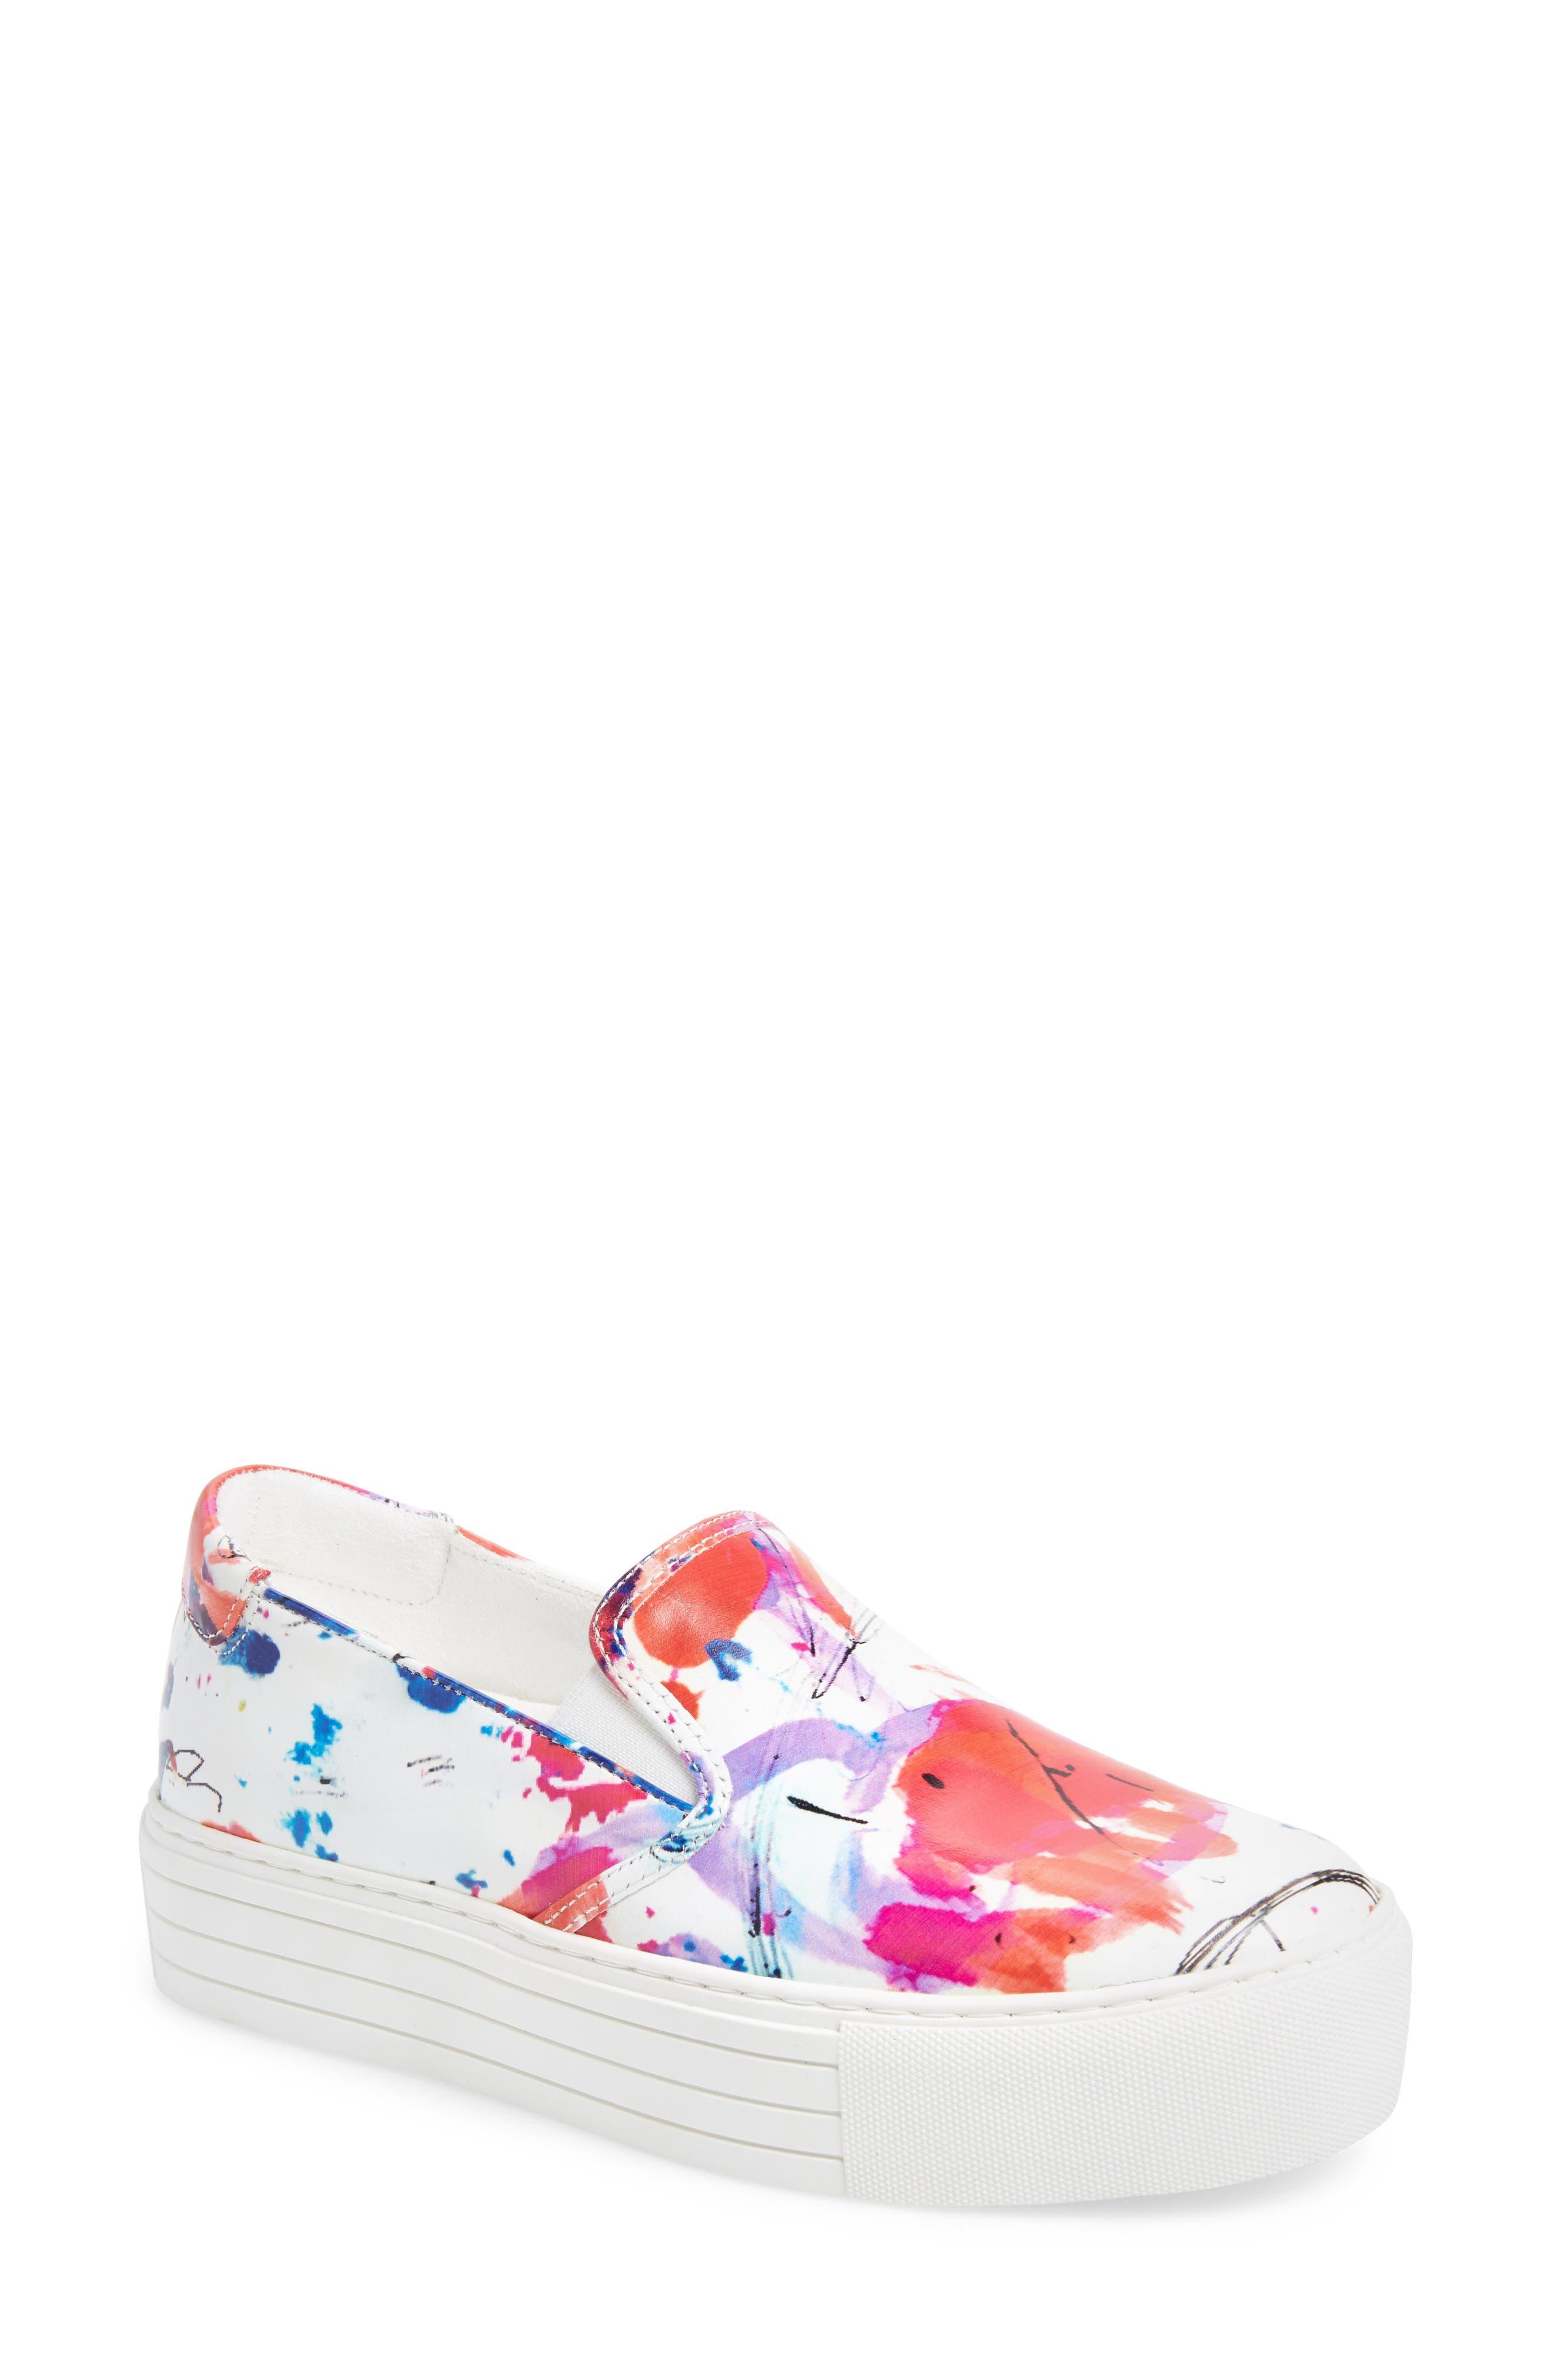 Joanie Slip-On Platform Sneaker,                         Main,                         color,